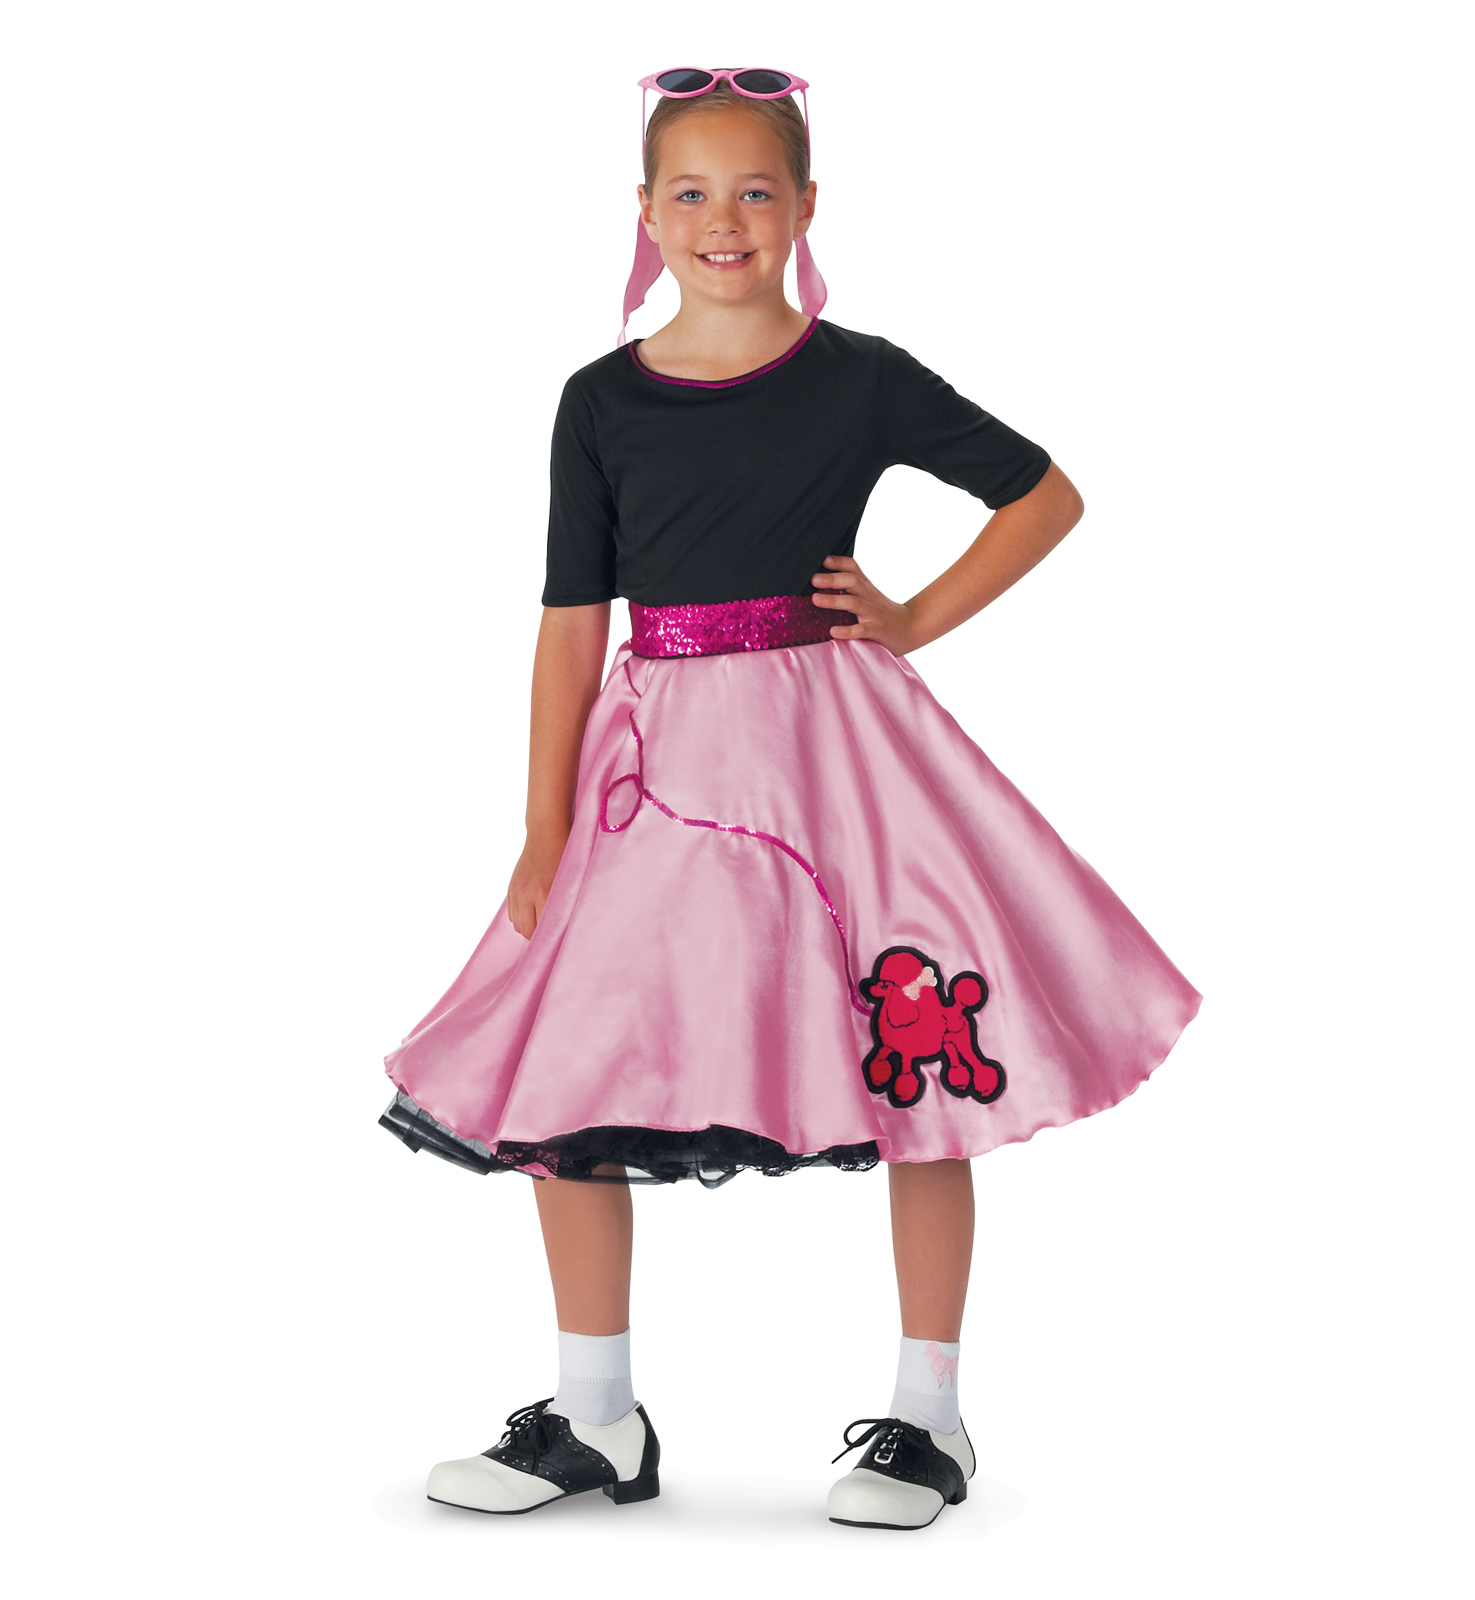 pink sock hop child costume buycostumescom - Halloween Express Mcdonough Ga